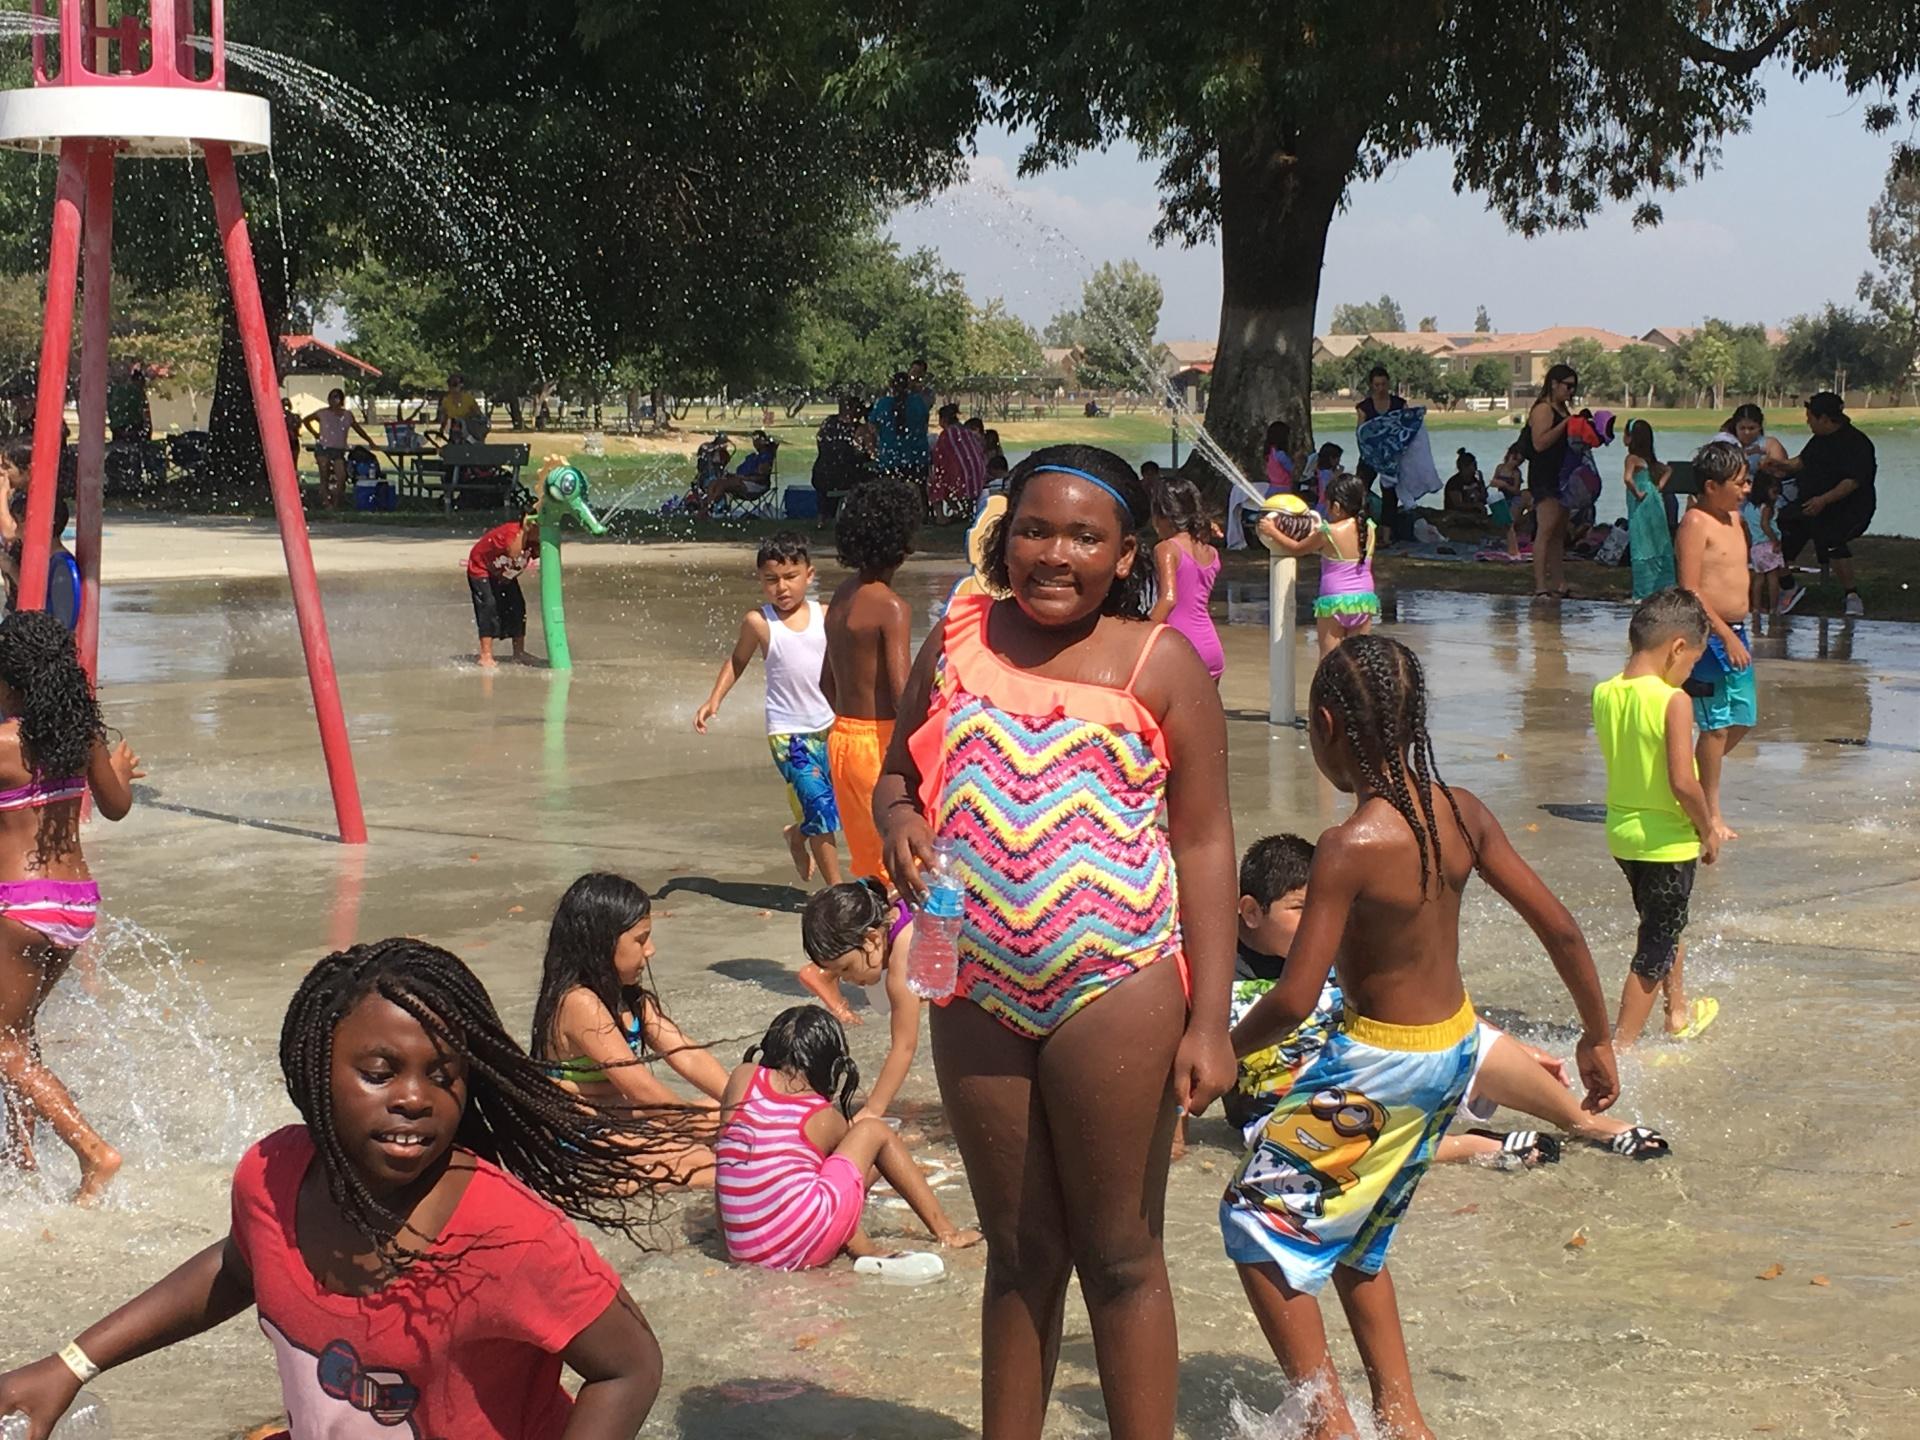 Day at Guasti Park